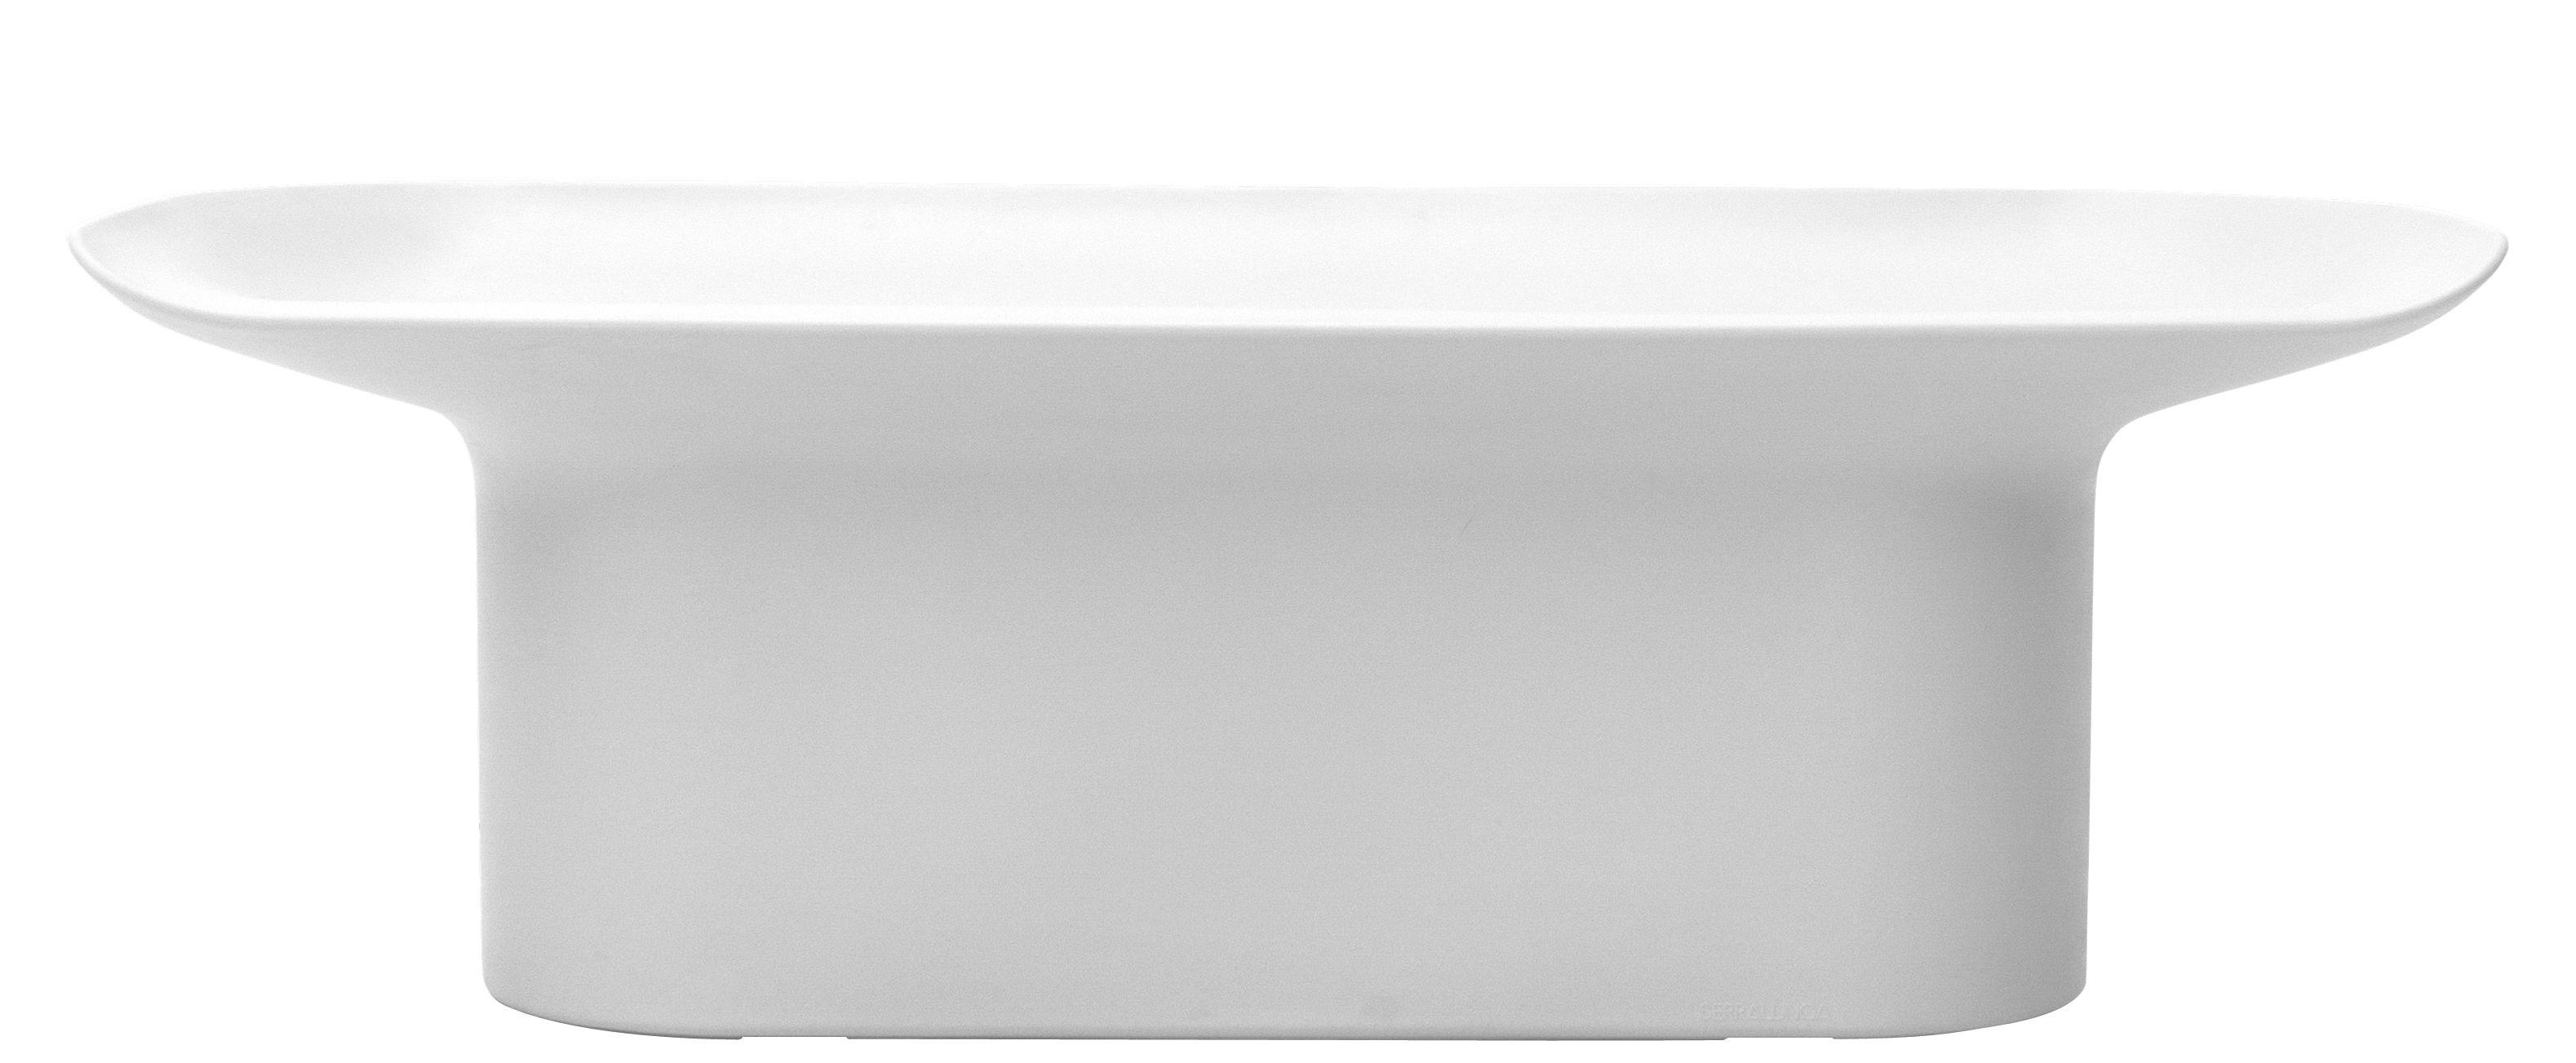 Möbel - Bänke - Luba Bank / L 141 cm - Kunststoff - Serralunga - Weiß - rotationsgeformtes Polyäthylen